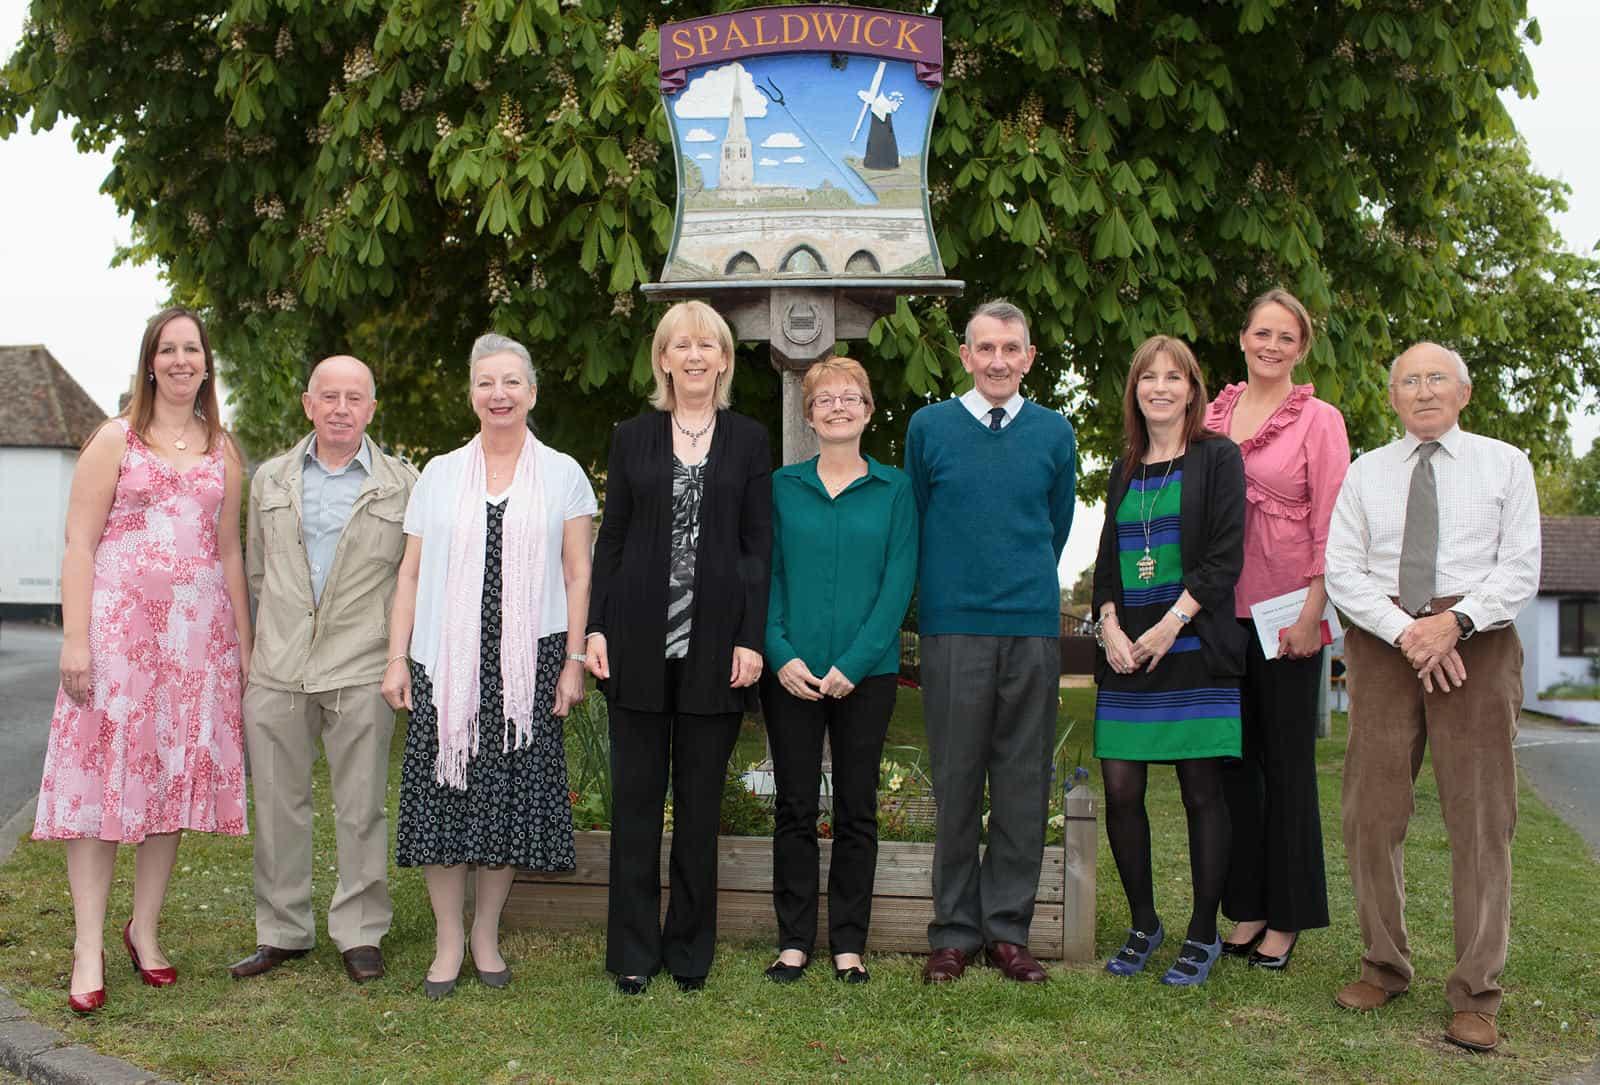 Spaldwick Social Group